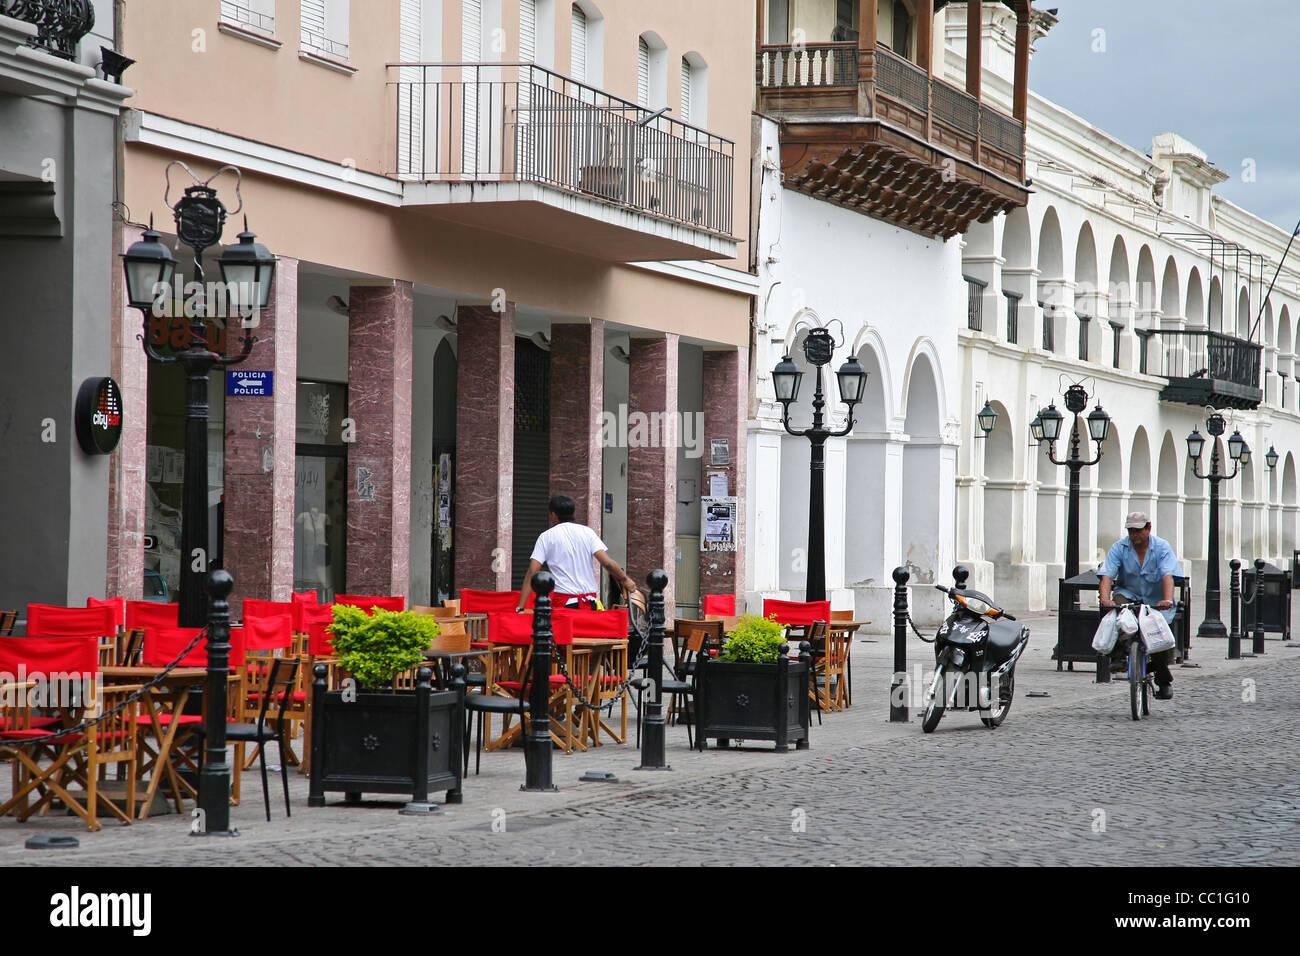 Restaurant along the Ninth of July Plaza / plaza 9 de julio, Salta, Argentina - Stock Image